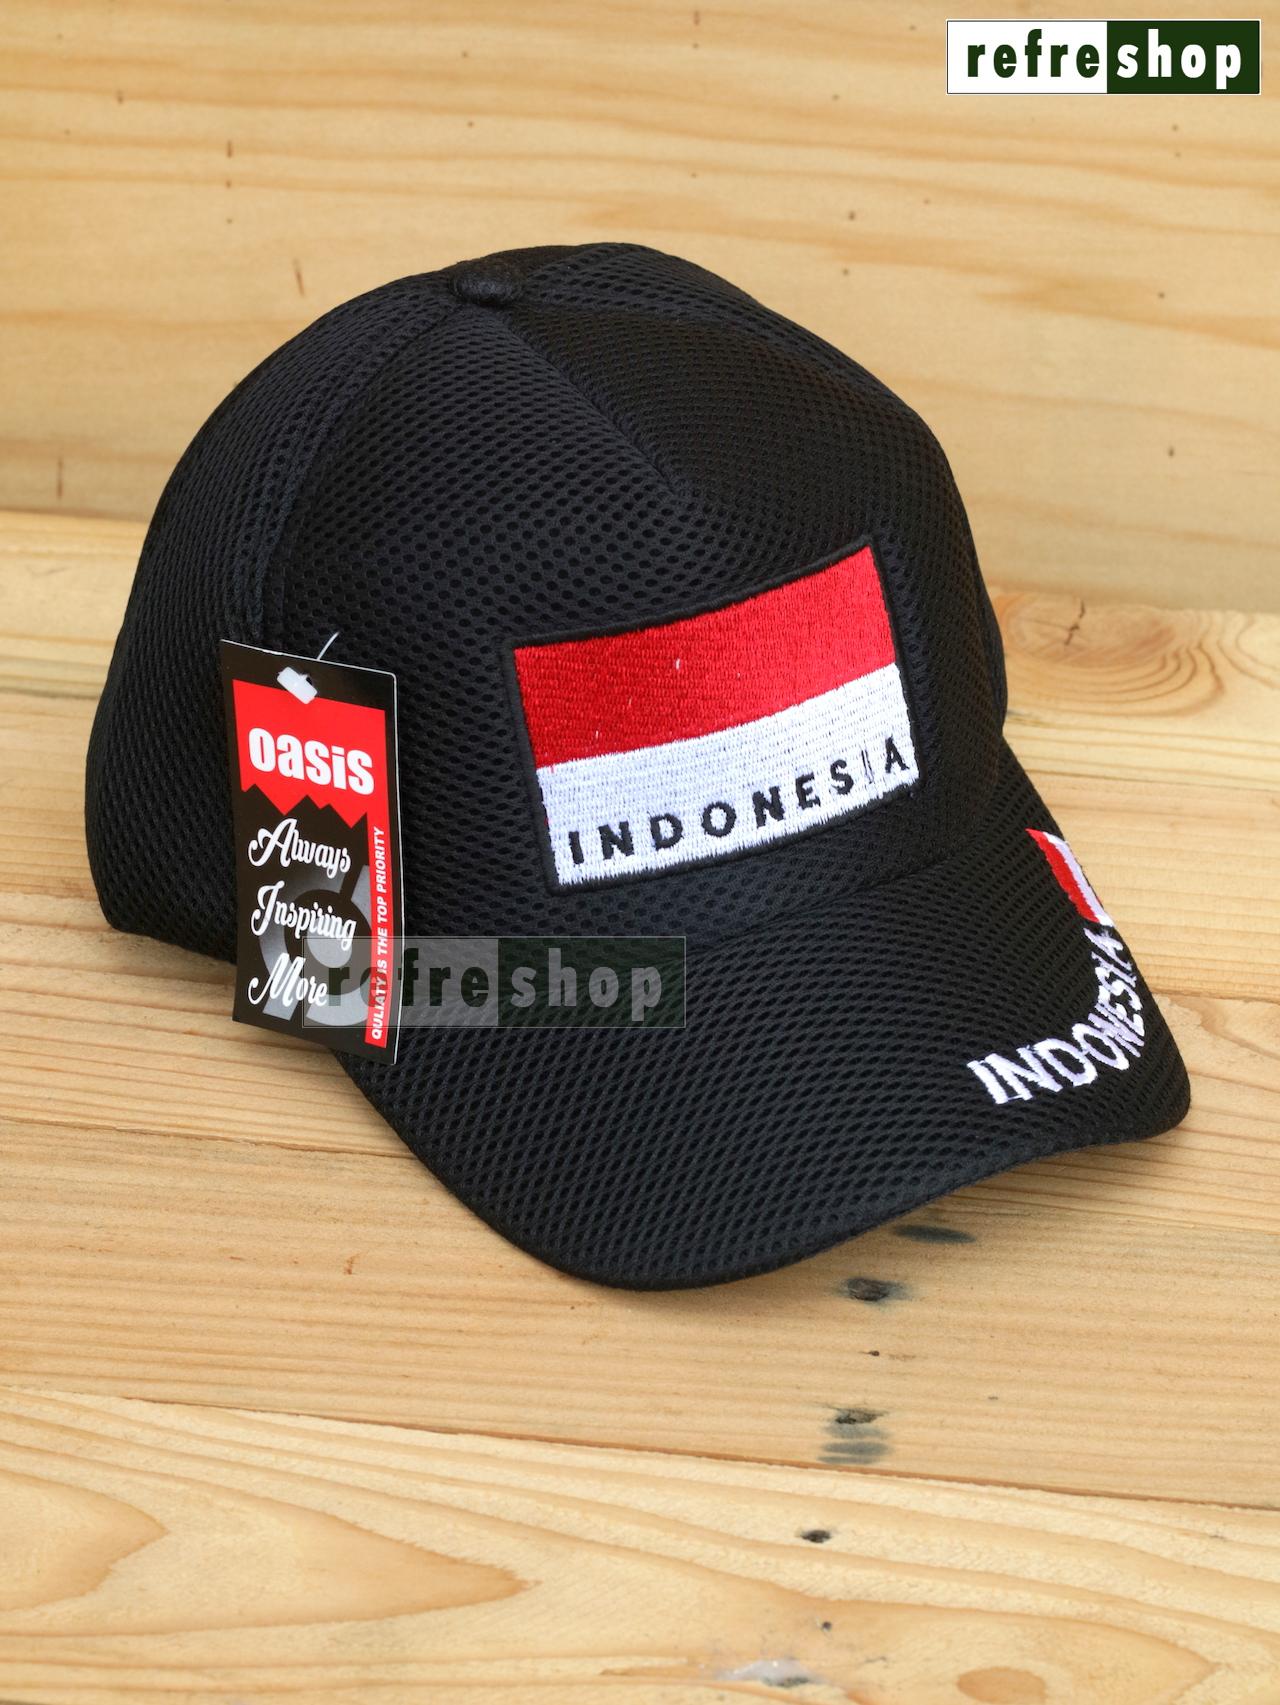 Harga Topi Security Hitam 2018 Cek Nya Termurah Tas Fashion Import Ysbj4866black Blogs Pictures And More On Wordpress Bendera Indonesia Jaring Nyaman